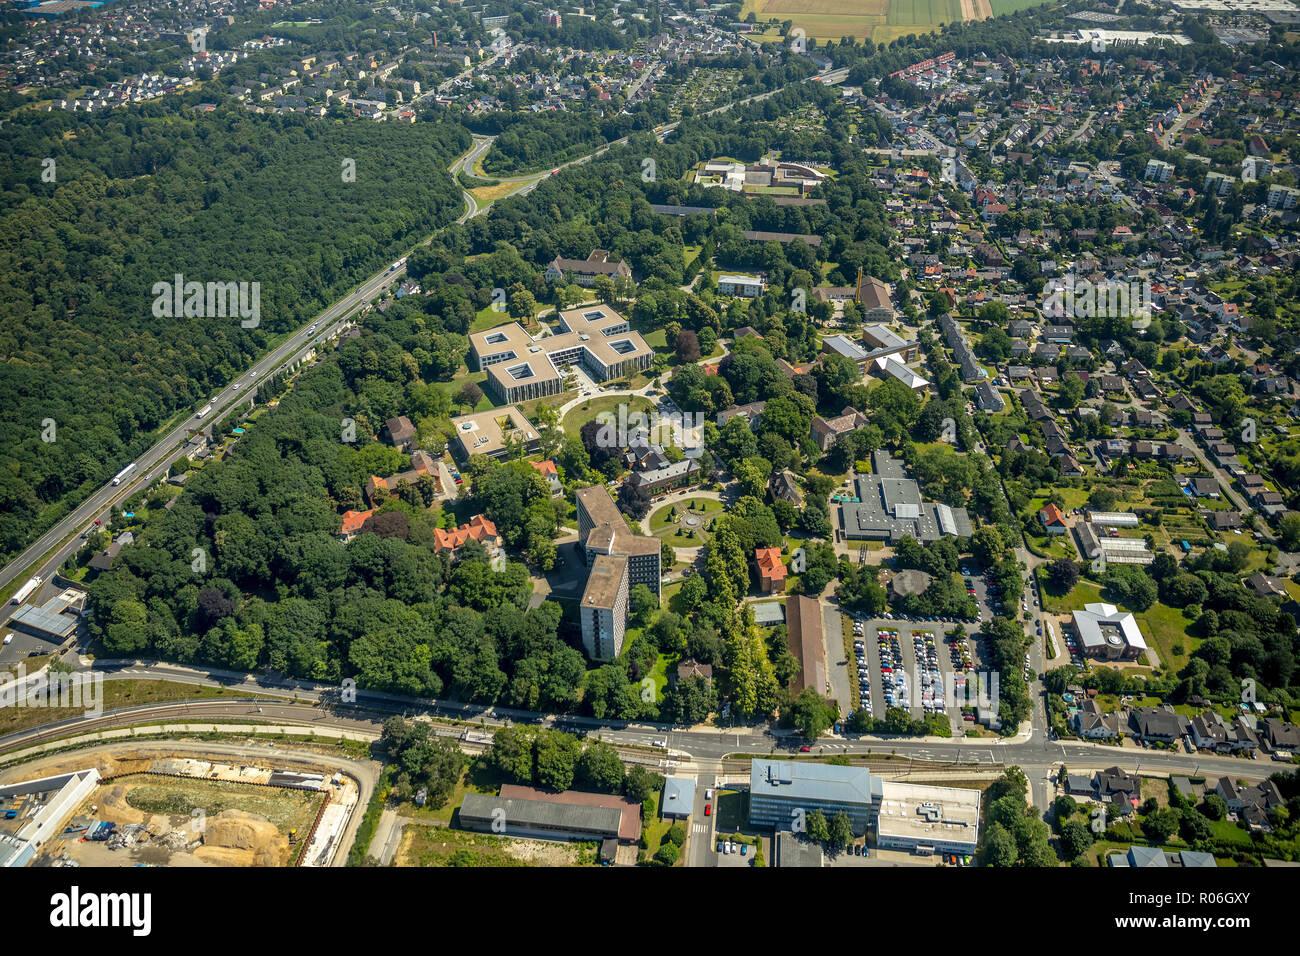 Aerial photo, LWL-Klinik Aplerbeck, Landeskrankenhaus Dortmund, Dortmund, Ruhr area, North Rhine-Westphalia, Germany, DEU, Europe, birds-eyes view, ae - Stock Image